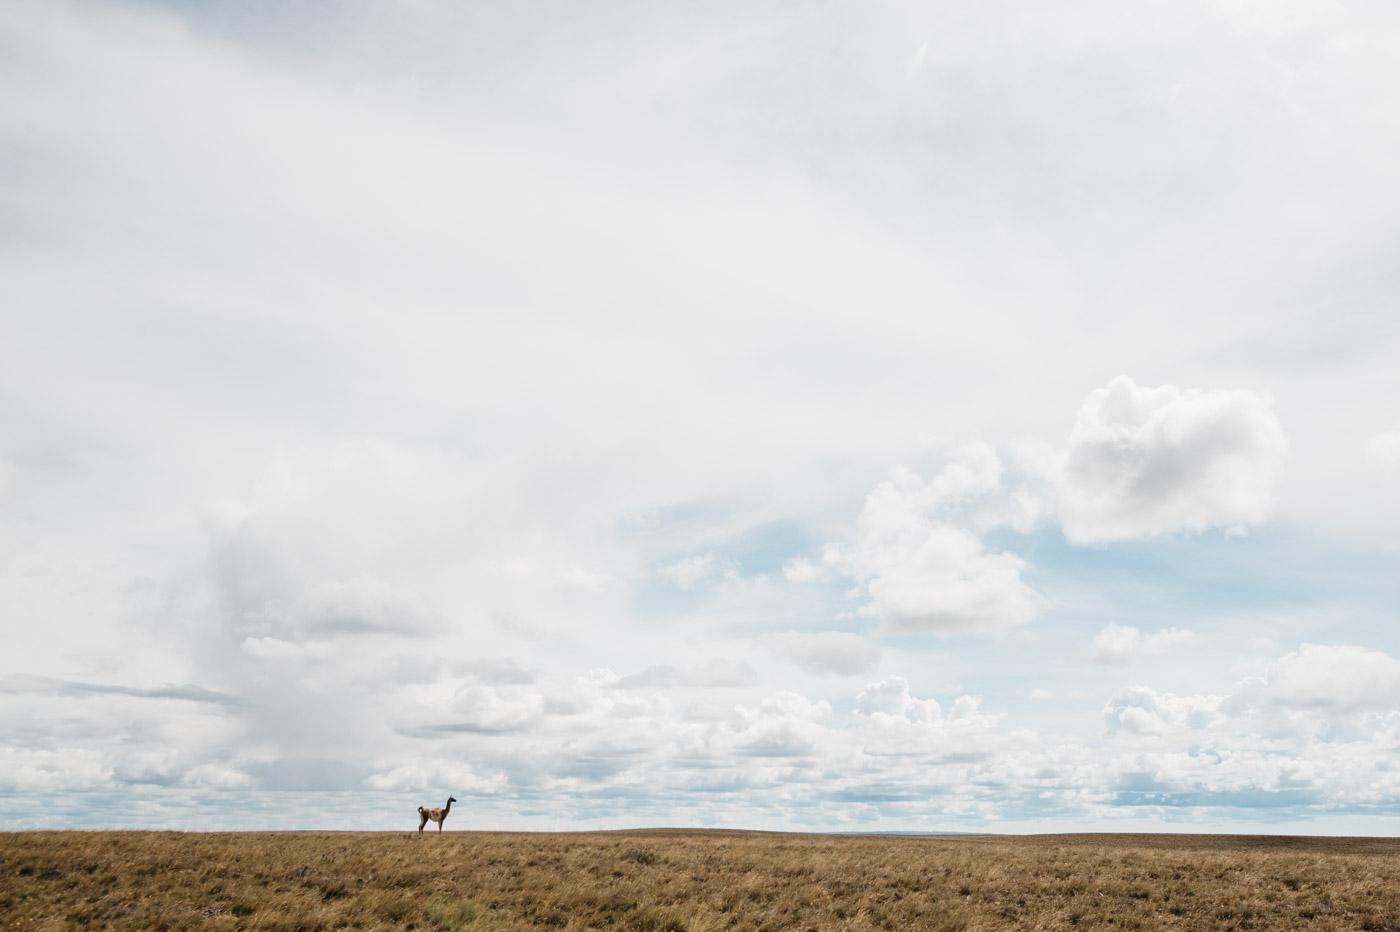 Impressions Driving Camping Patagonia Guanaco